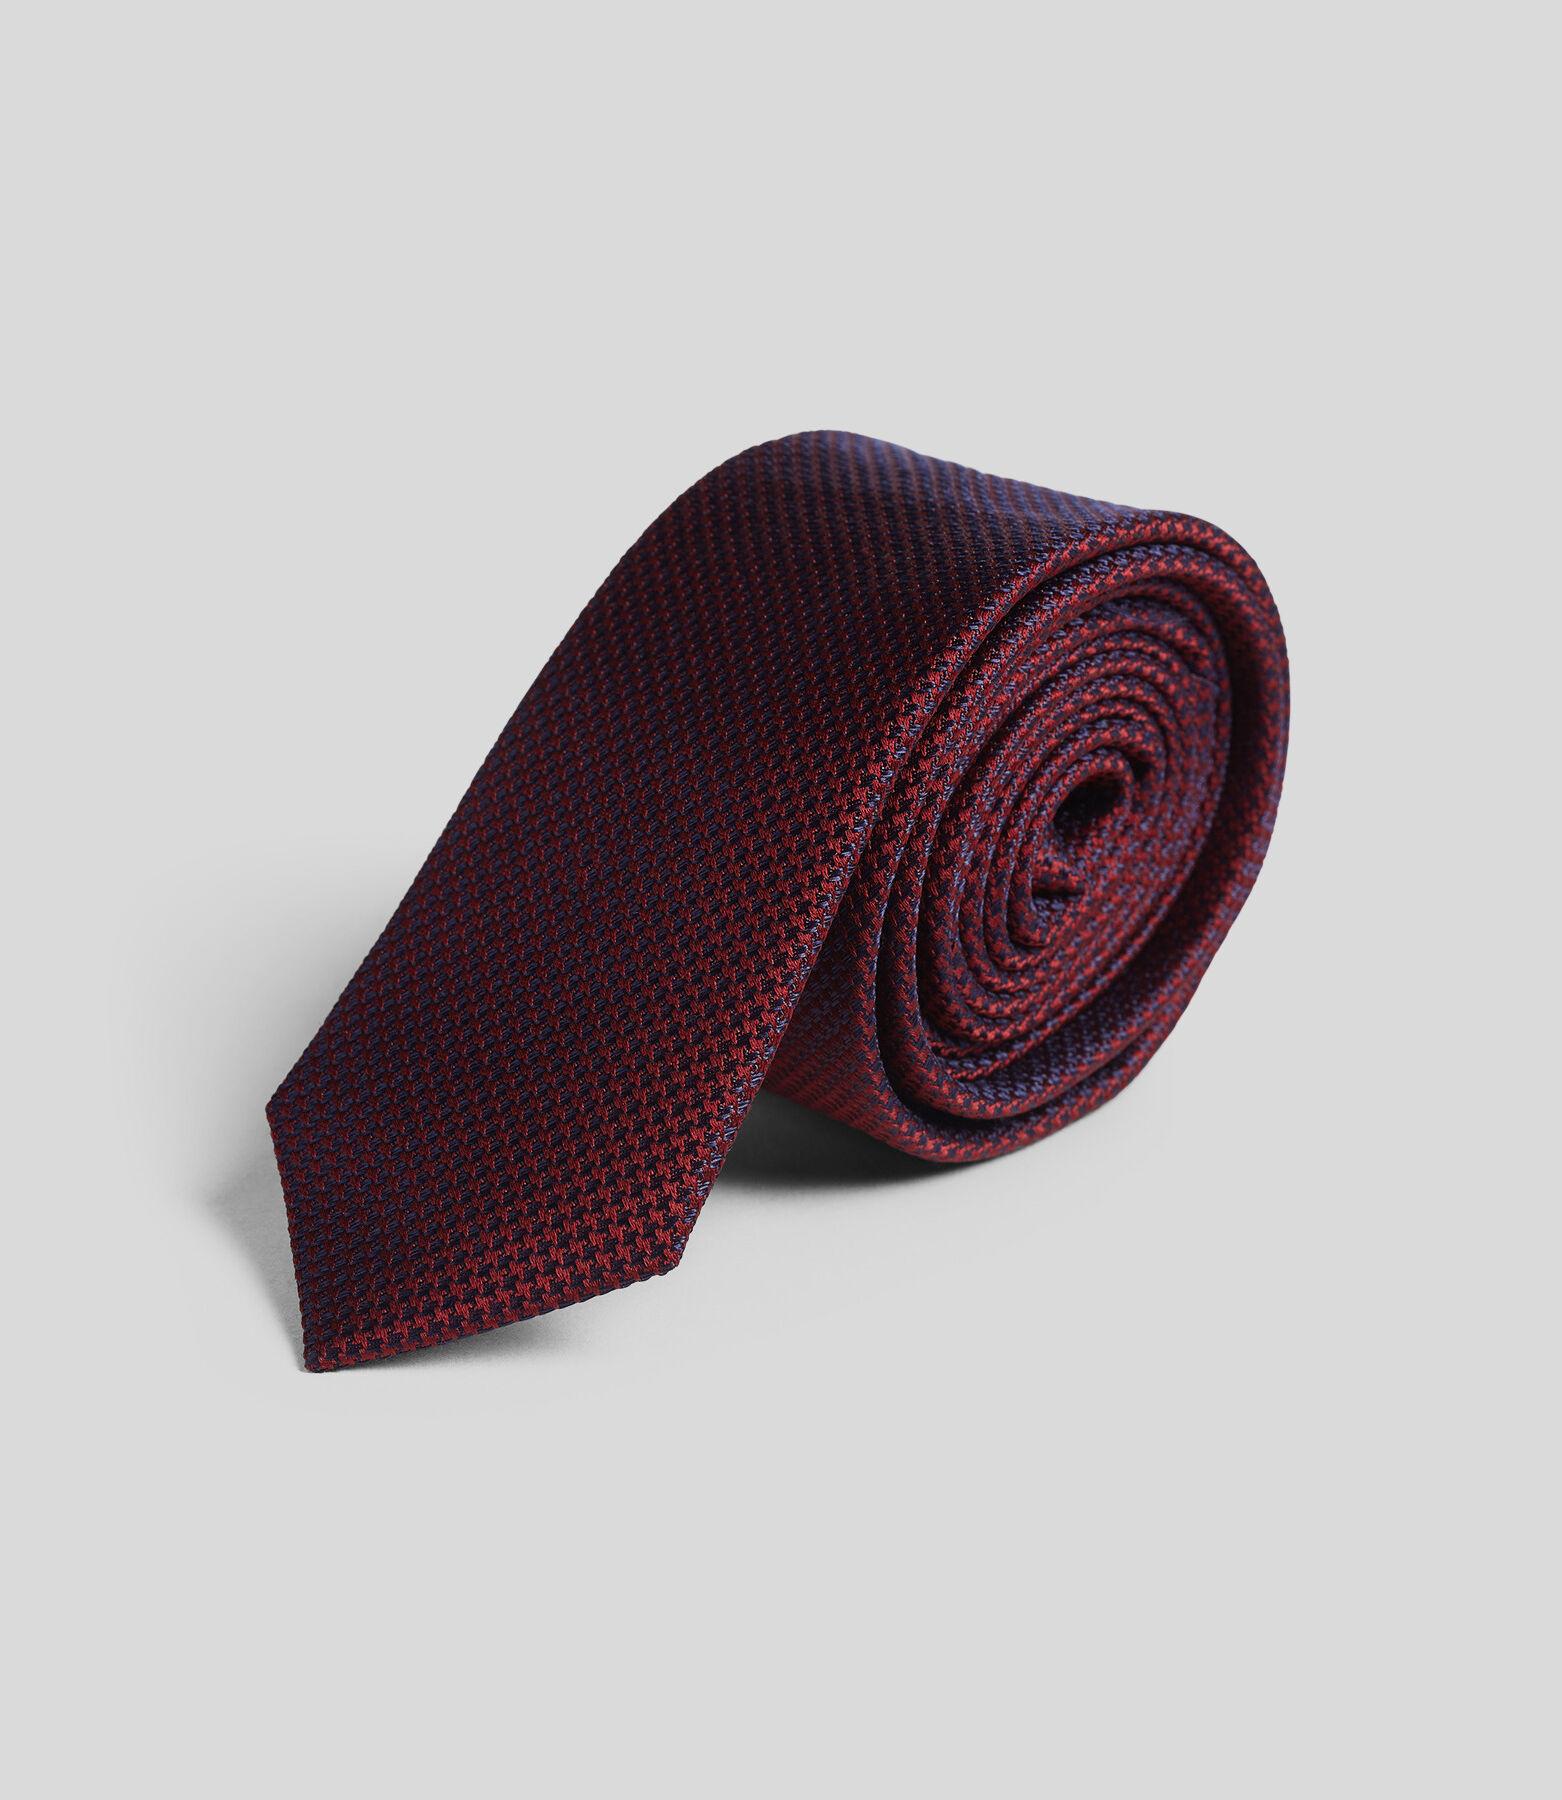 Cravate homme micro motif